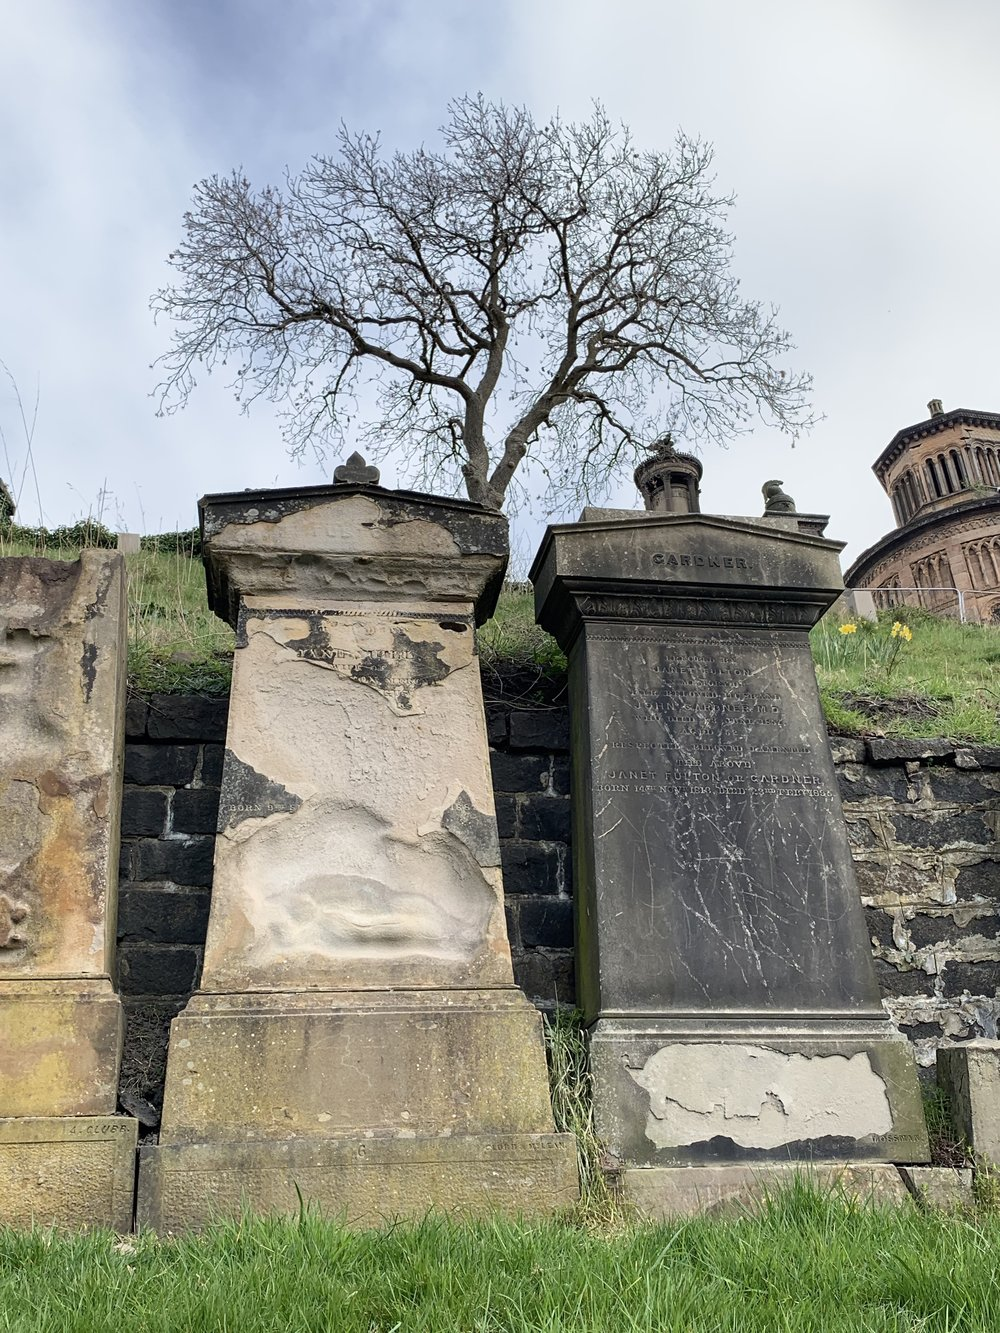 Time erases the names on gravestones.